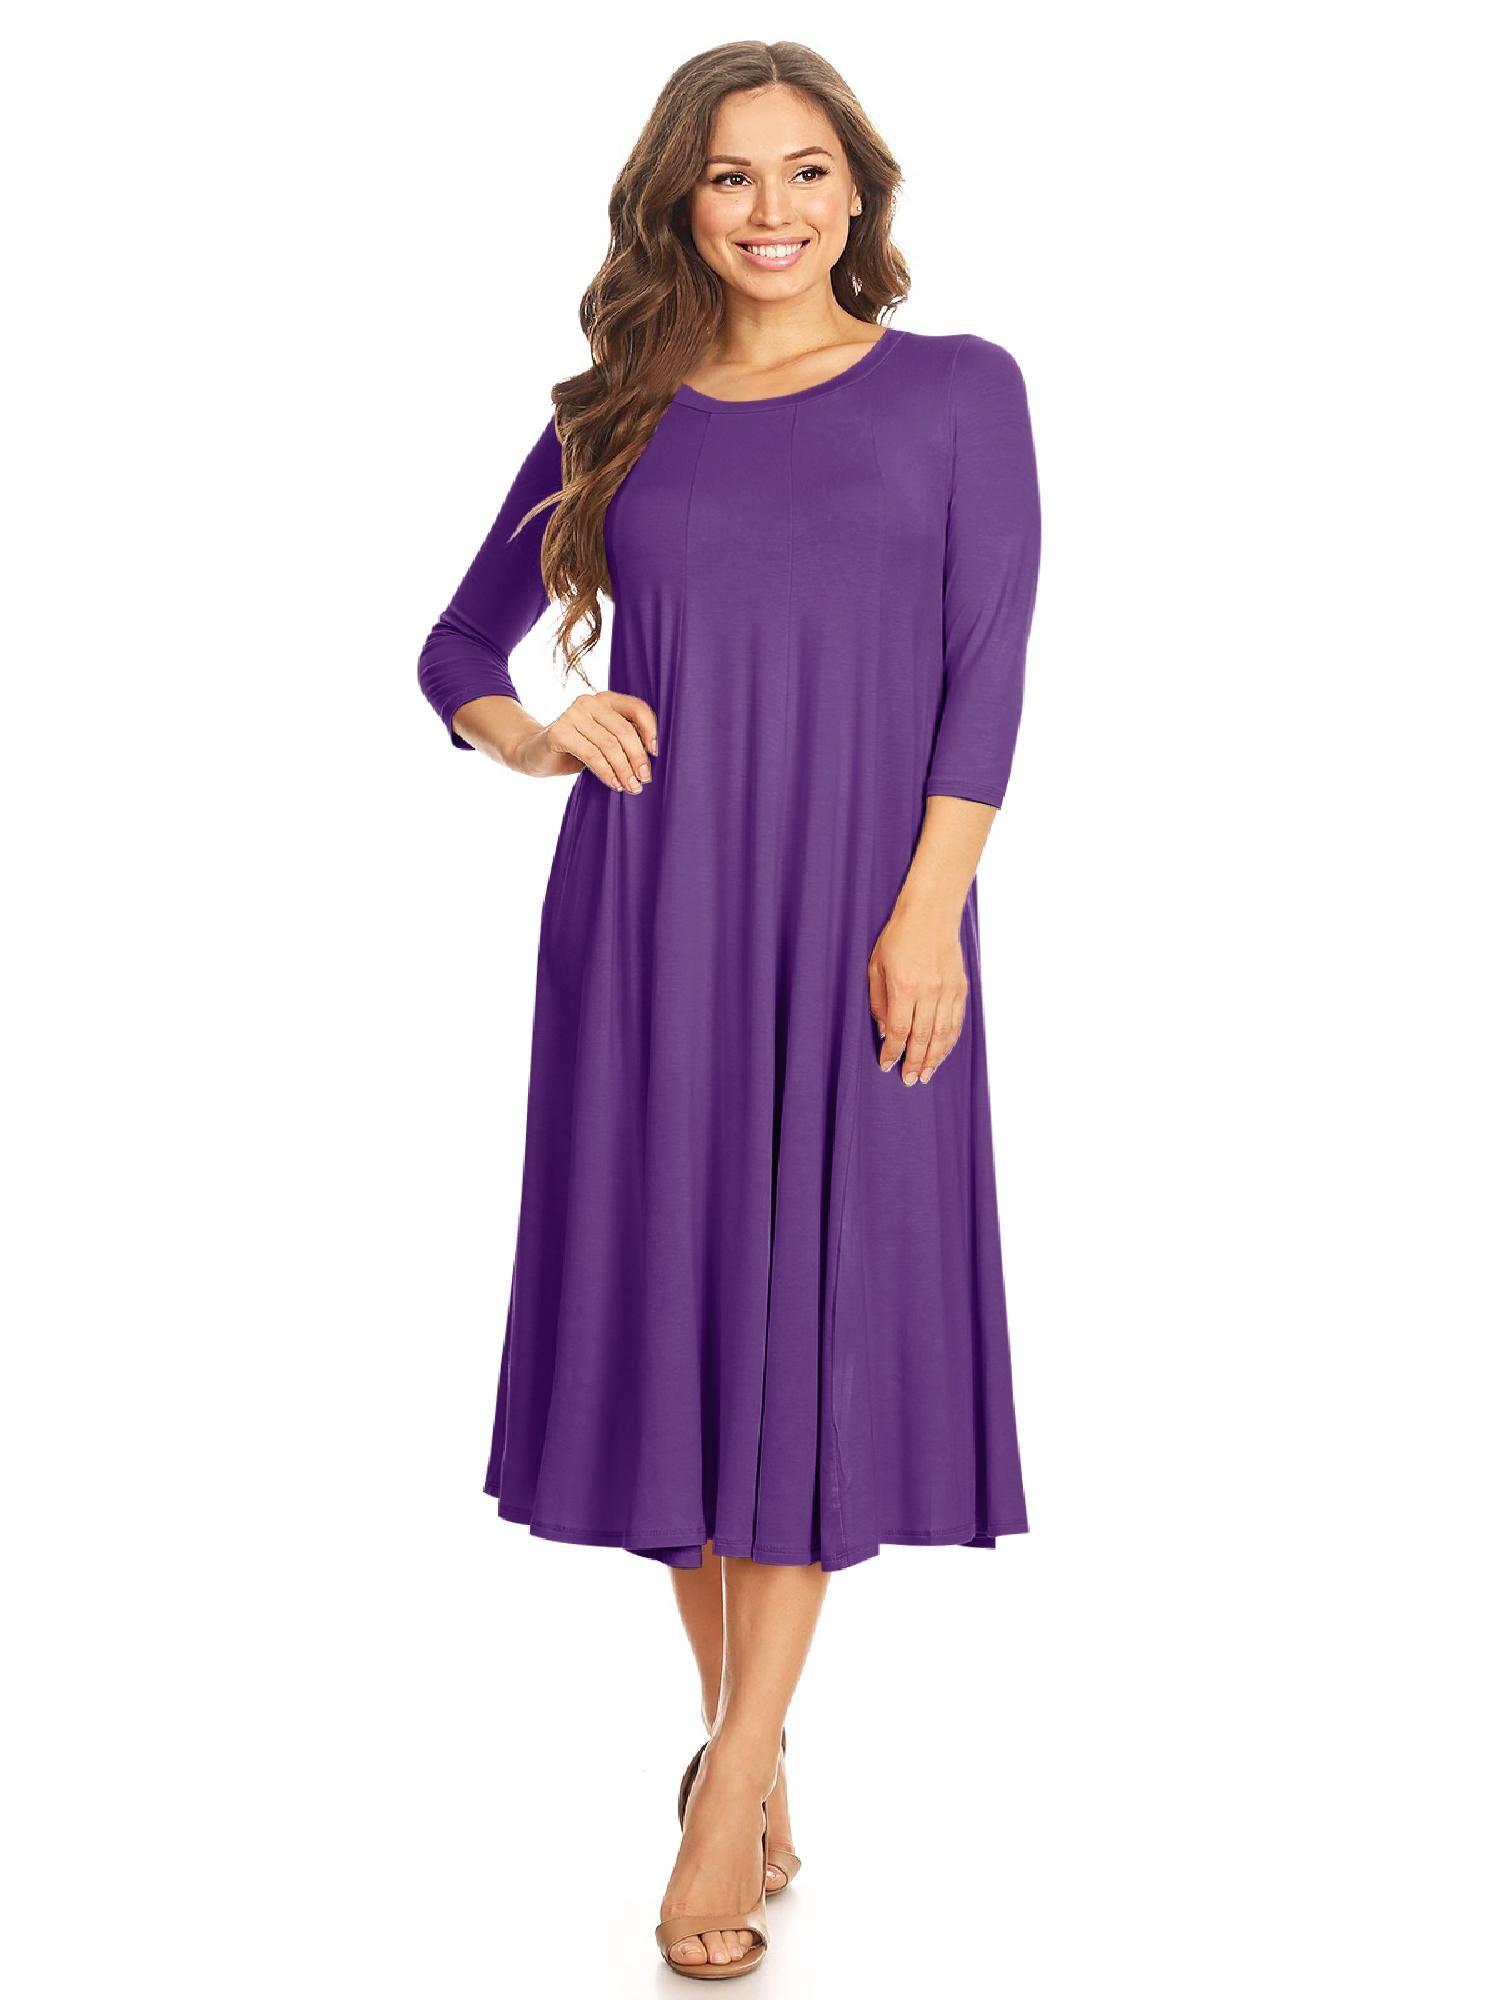 Moa Collection Women S Casual Basic Comfy 3 4 Sleeve Flare A Line Midi Long Maxi Dress Walmart Com Long Maxi Dress Maxi Dresses Casual Dresses [ 2000 x 1500 Pixel ]